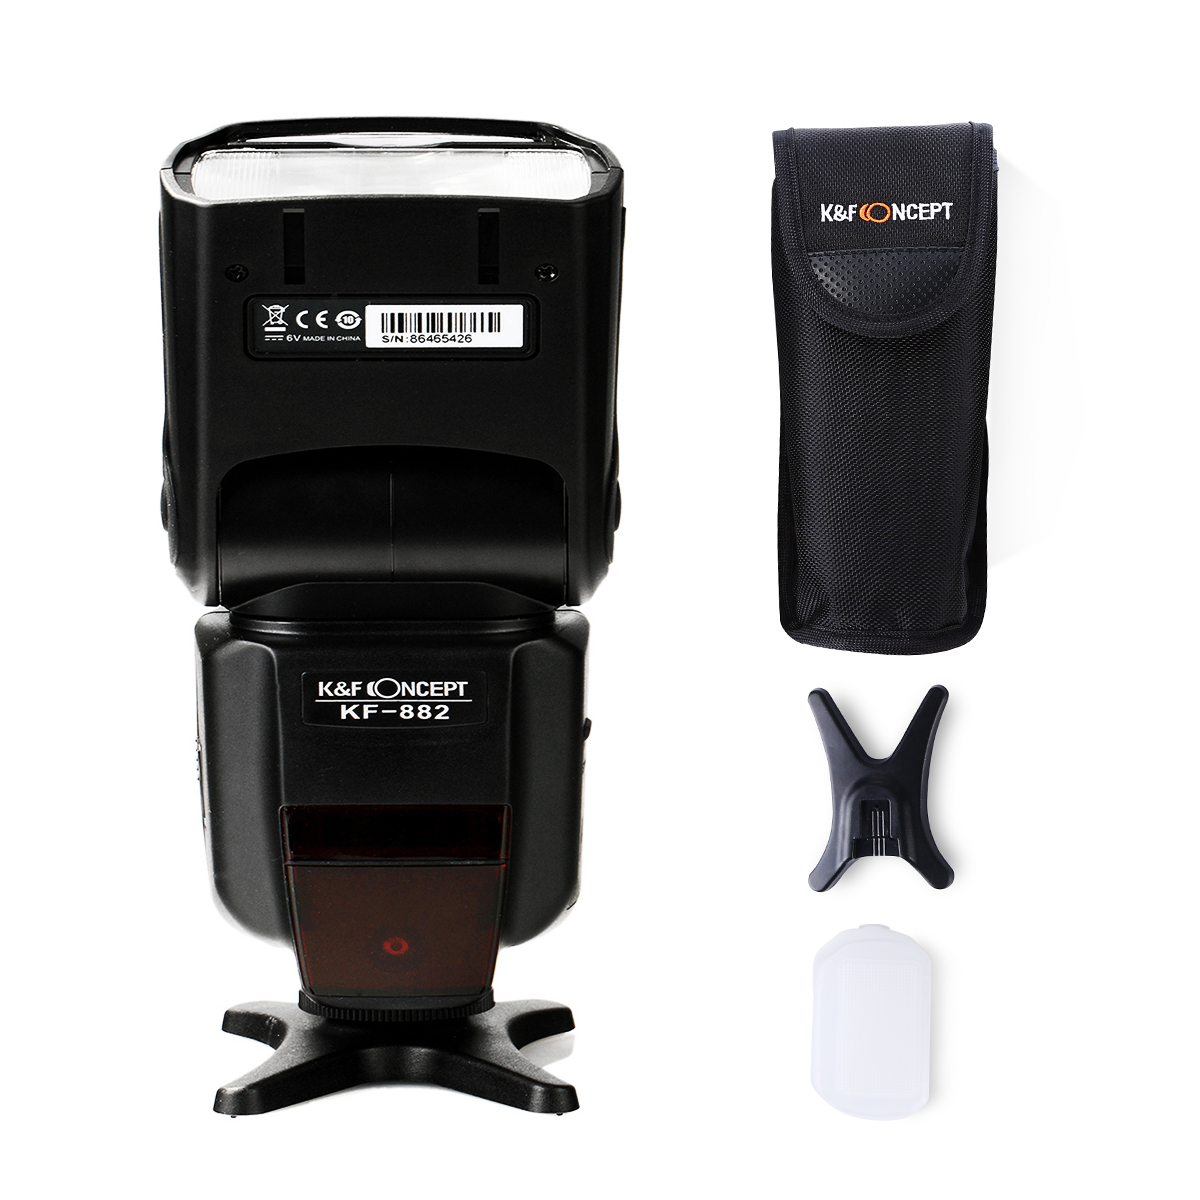 Nikon用フラッシュ KF-882N ハイスピードシンクロTTL対応[K&F Concept]